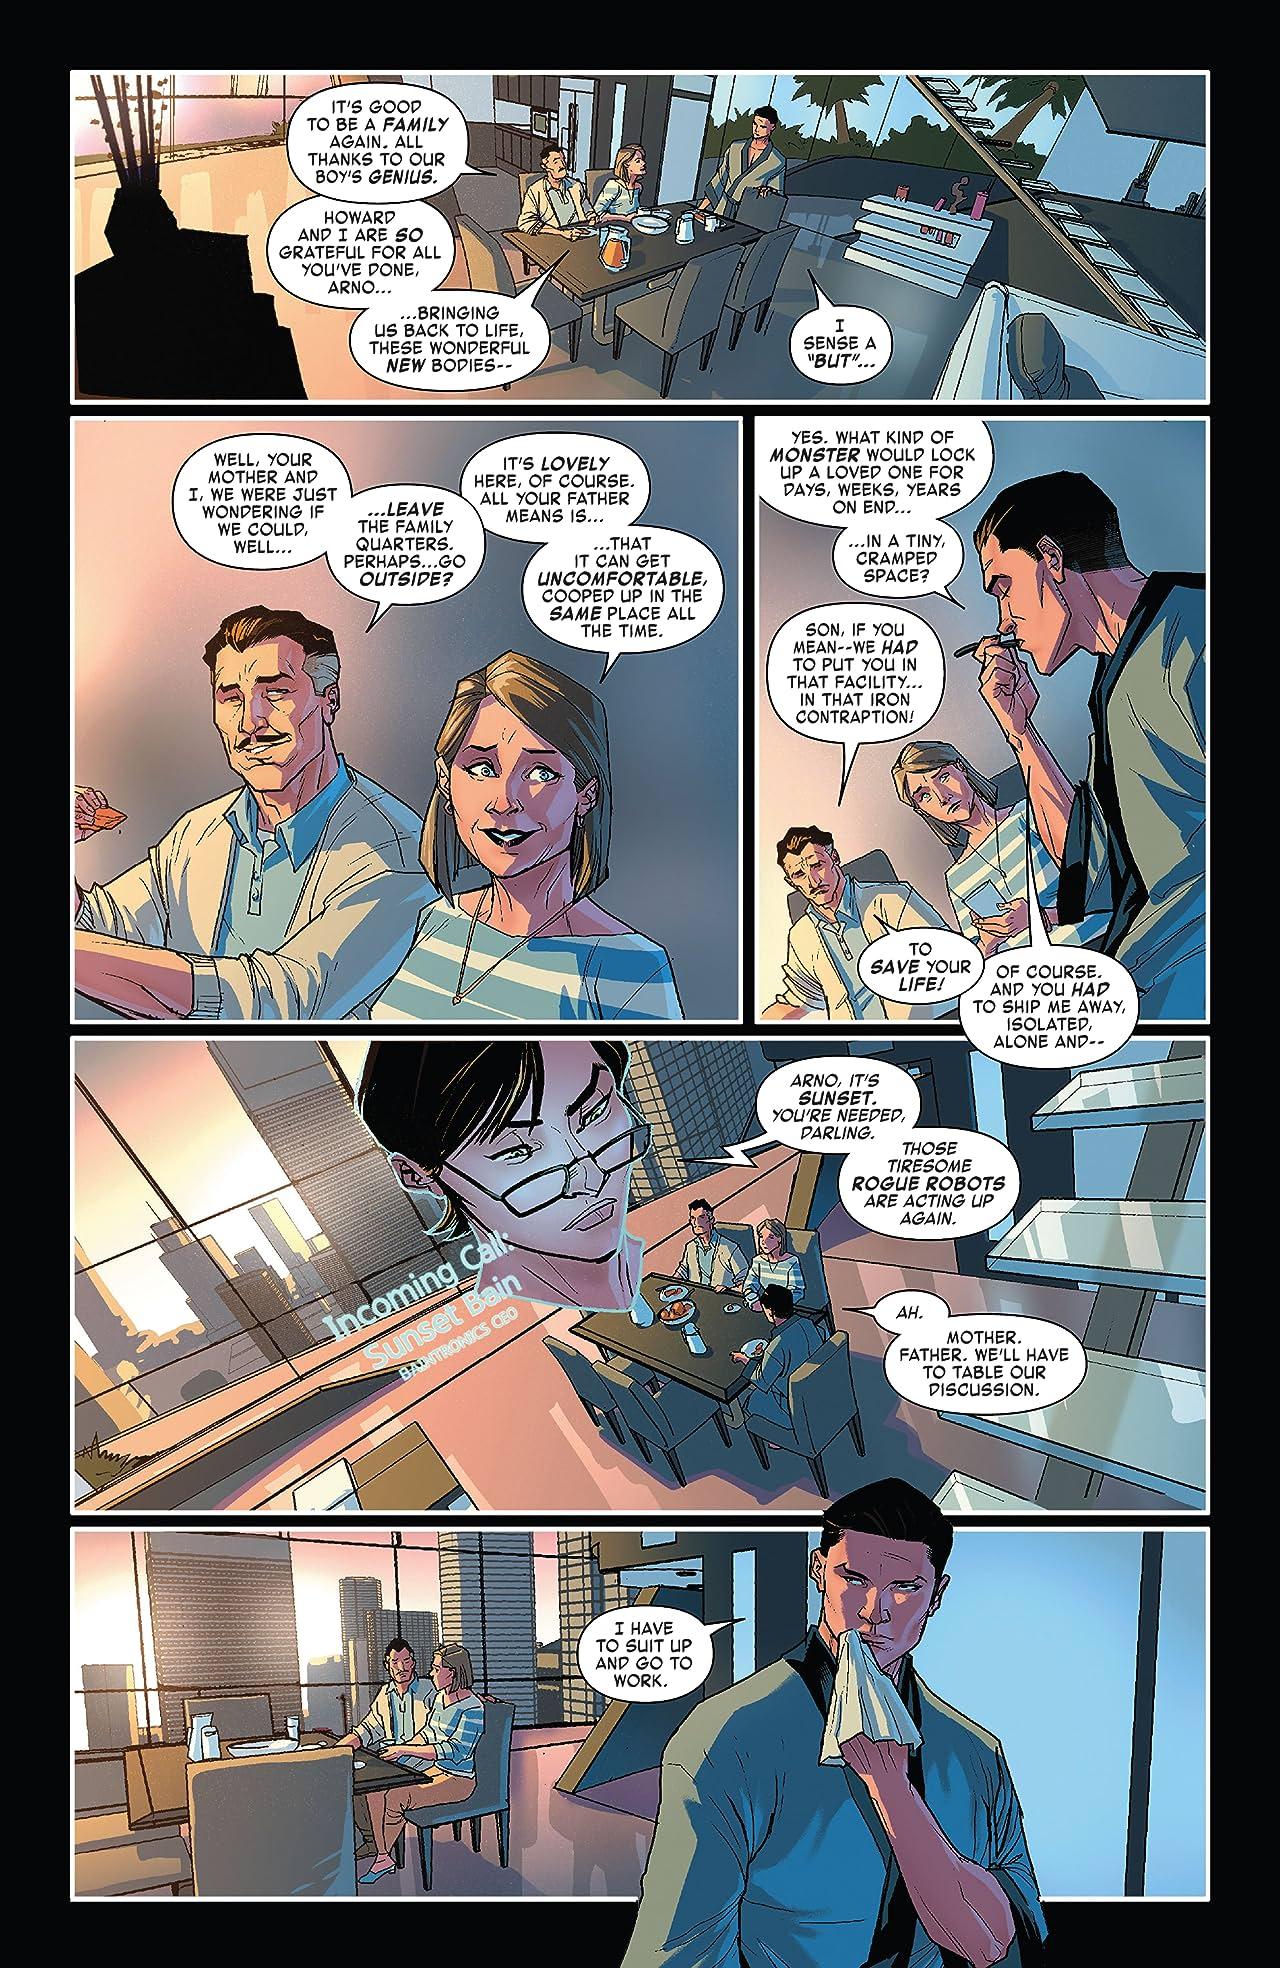 Iron Man 2020: Robot Revolution